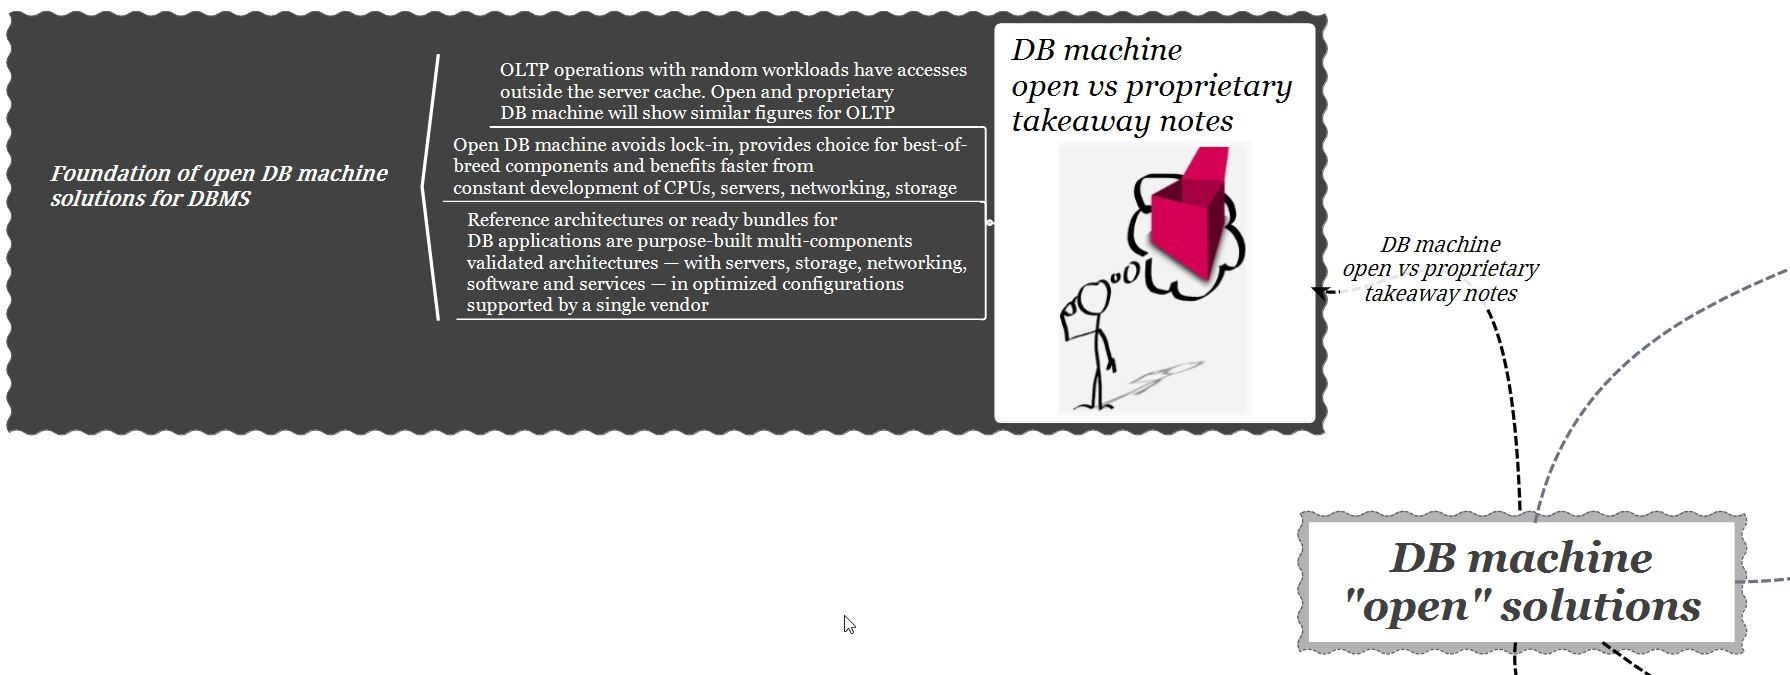 db machine open - takeaway notes